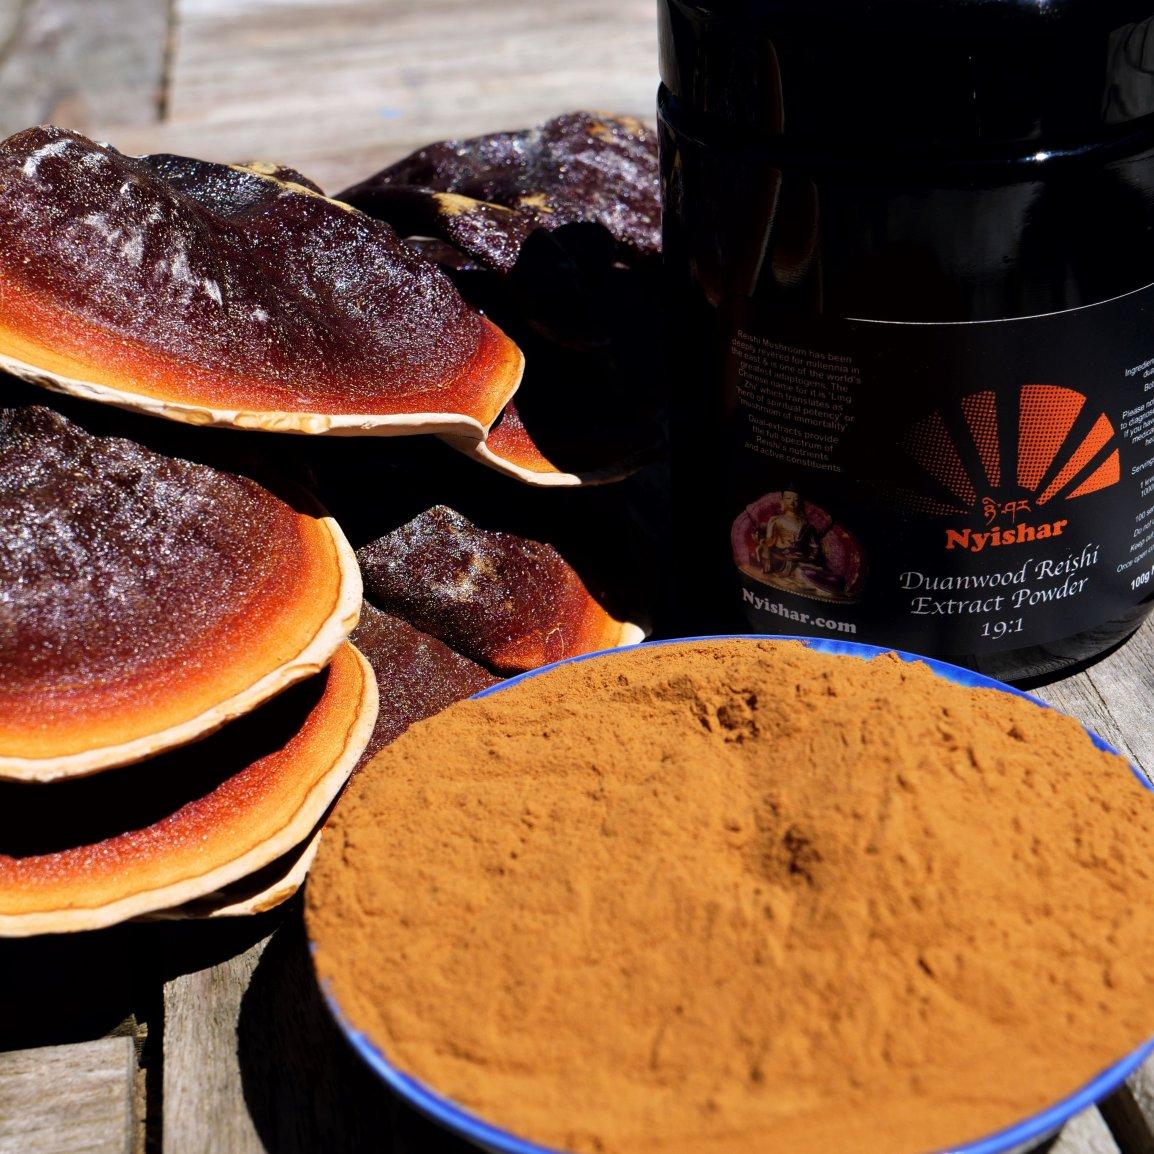 Duanwood Reishi Dual-Extract Powder 19:1 0001